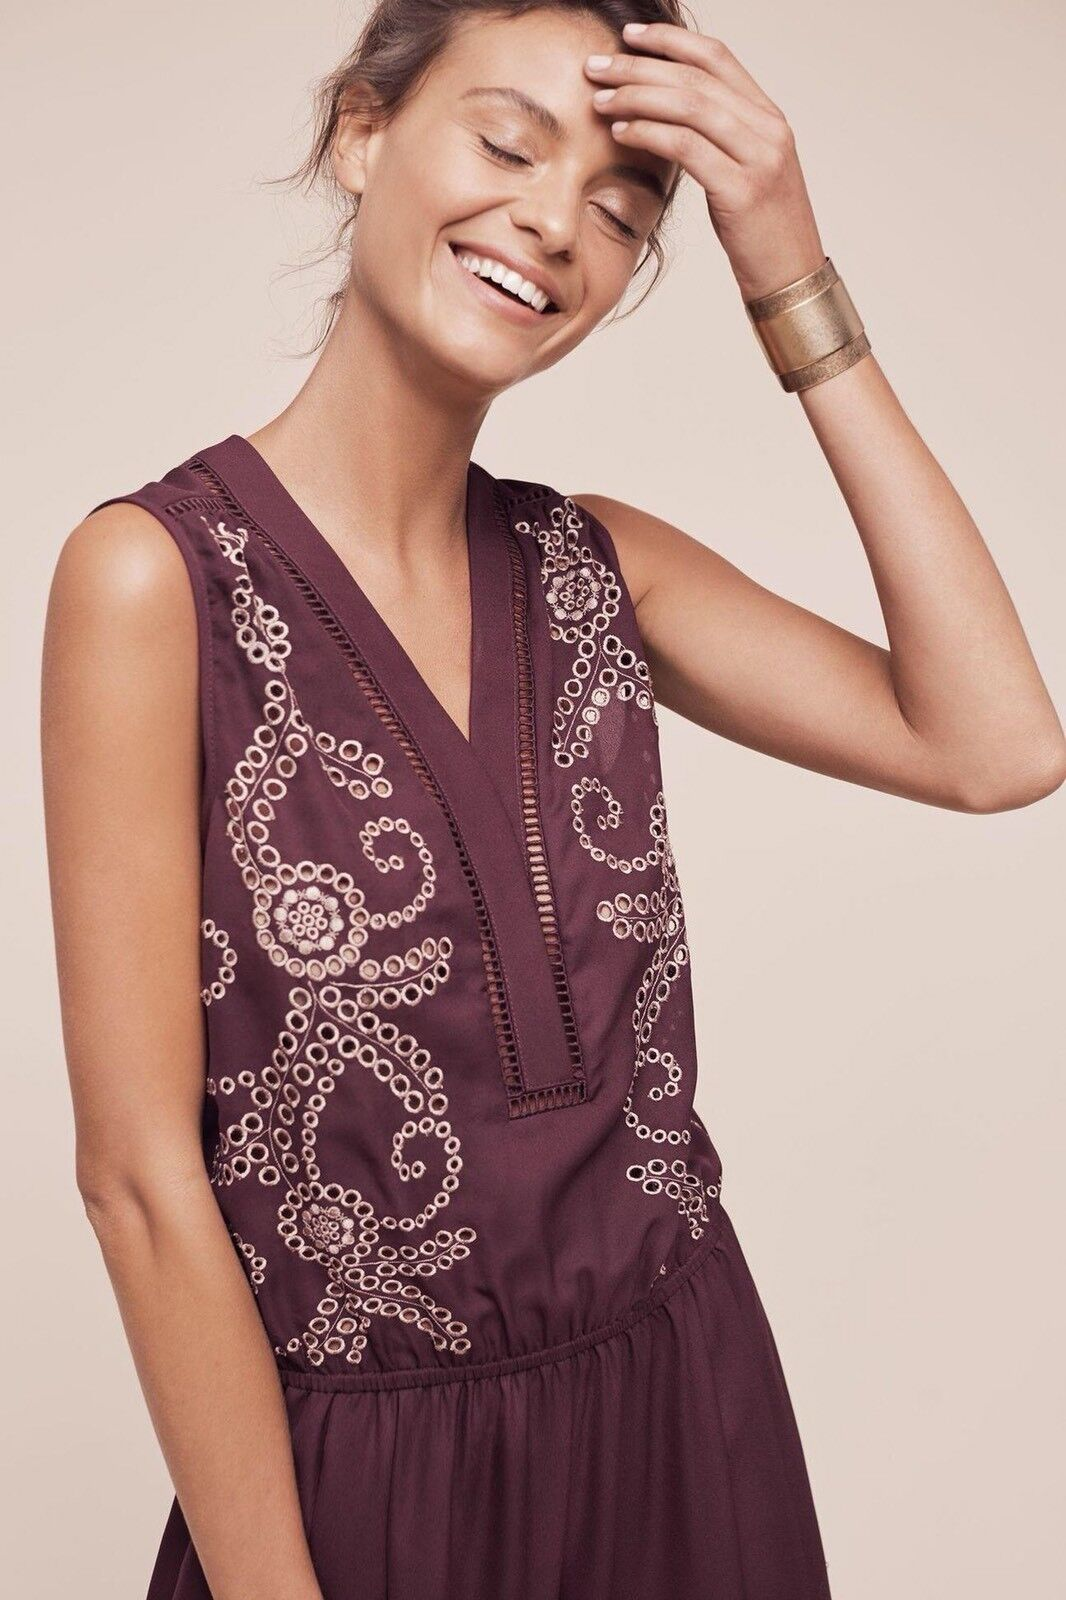 8b0c037588722 ... Anthropologie Teresa Teresa Teresa Embroidered Jumpsuit by Ranna Gill  Size Sz Medium Petite MP 58446e ...